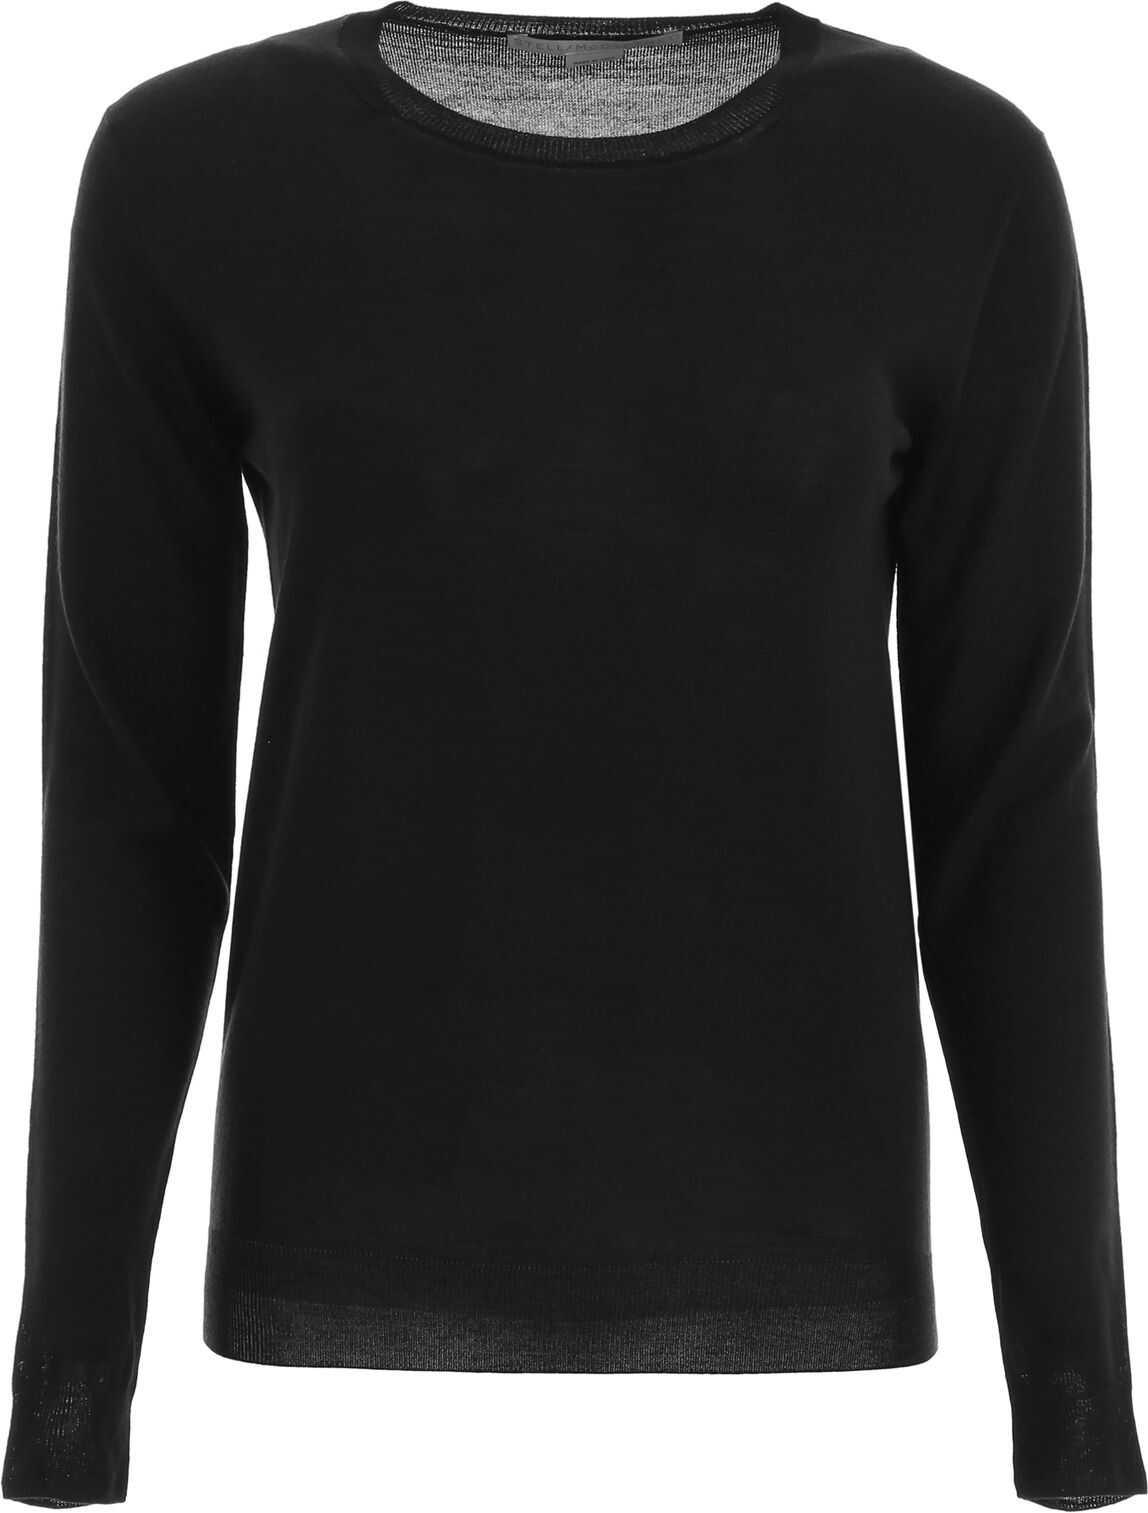 adidas by Stella McCartney Crew Neck Pullover BLACK